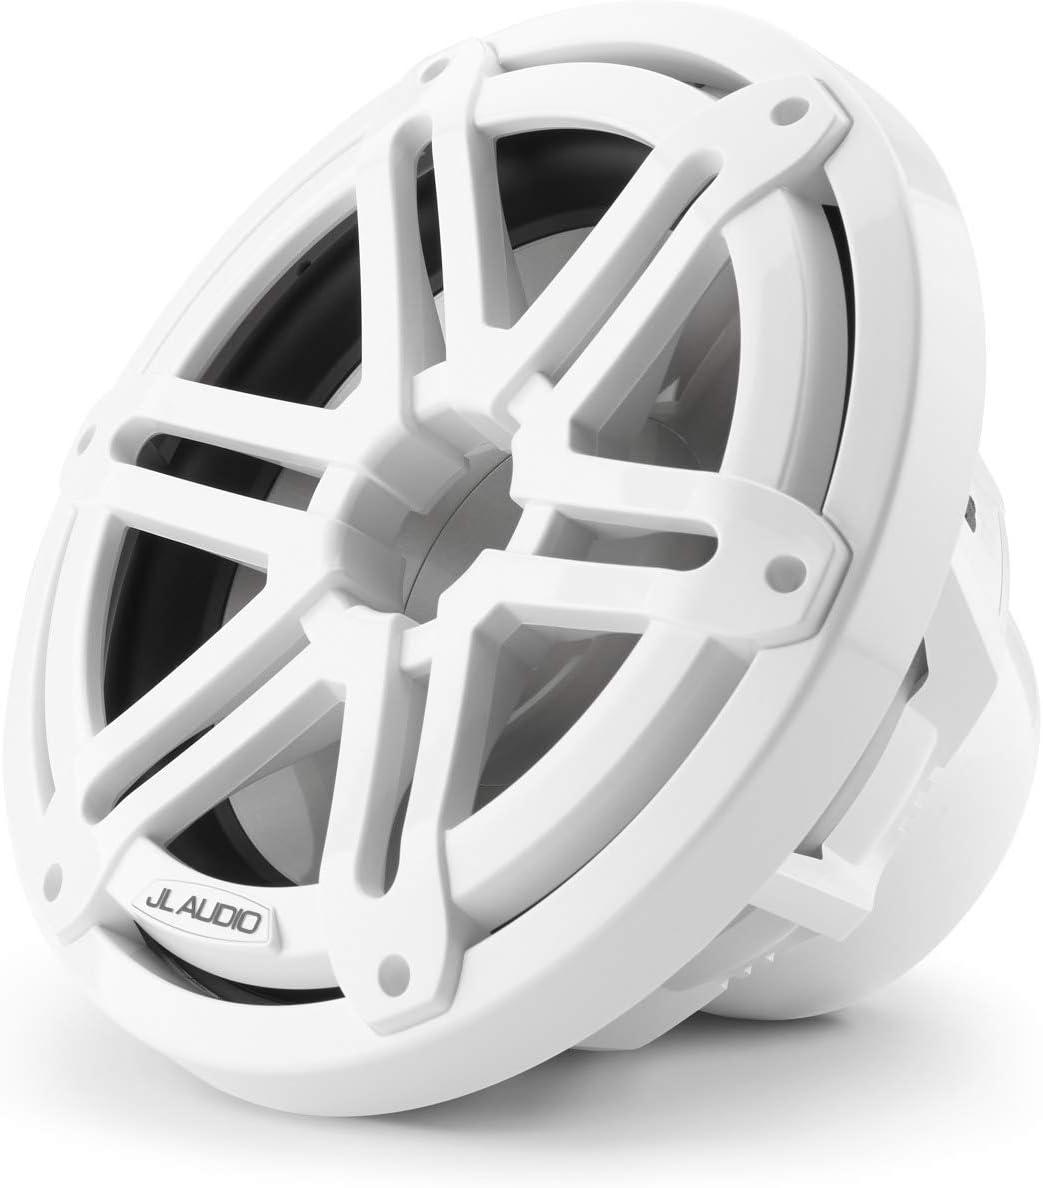 Sport Grille JL Audio M3-10IB-S-Gw-4 10 Infinite Baffle Marine Subwoofer White